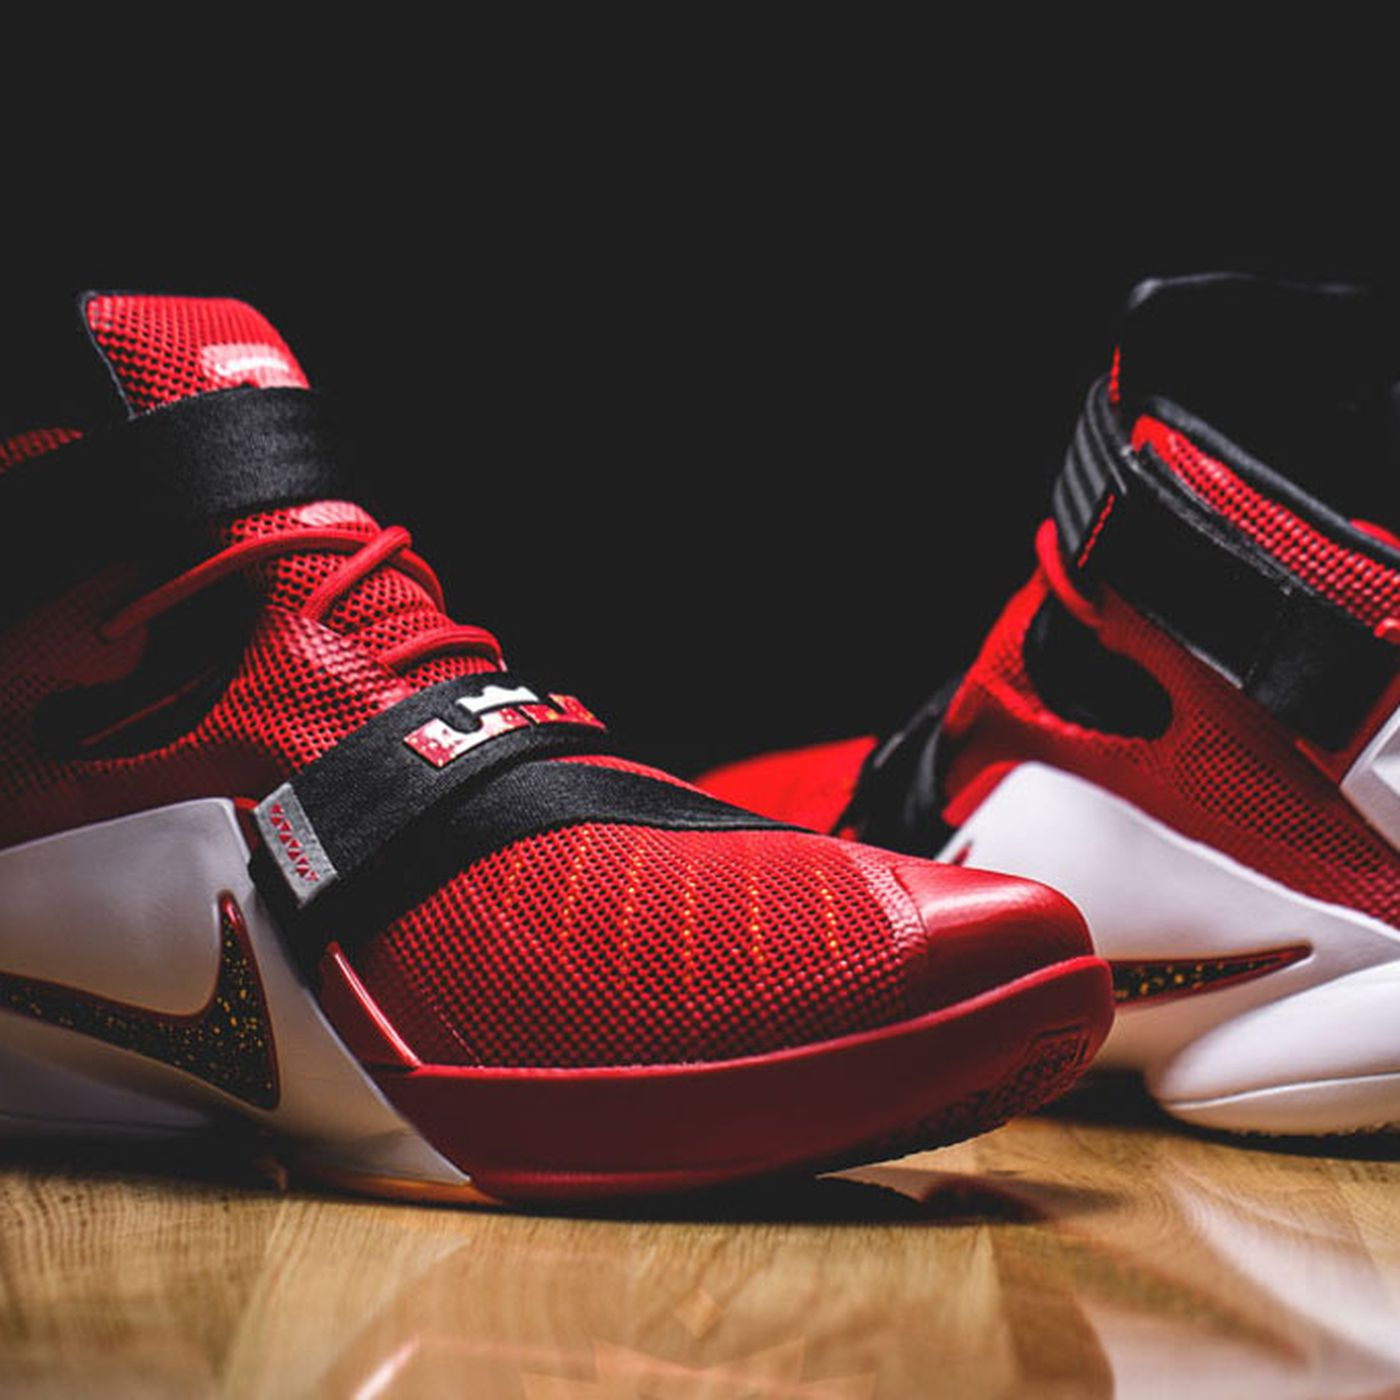 3b0ca9265a2 Cavs Kicks  Nike Zoom LeBron Soldier 9